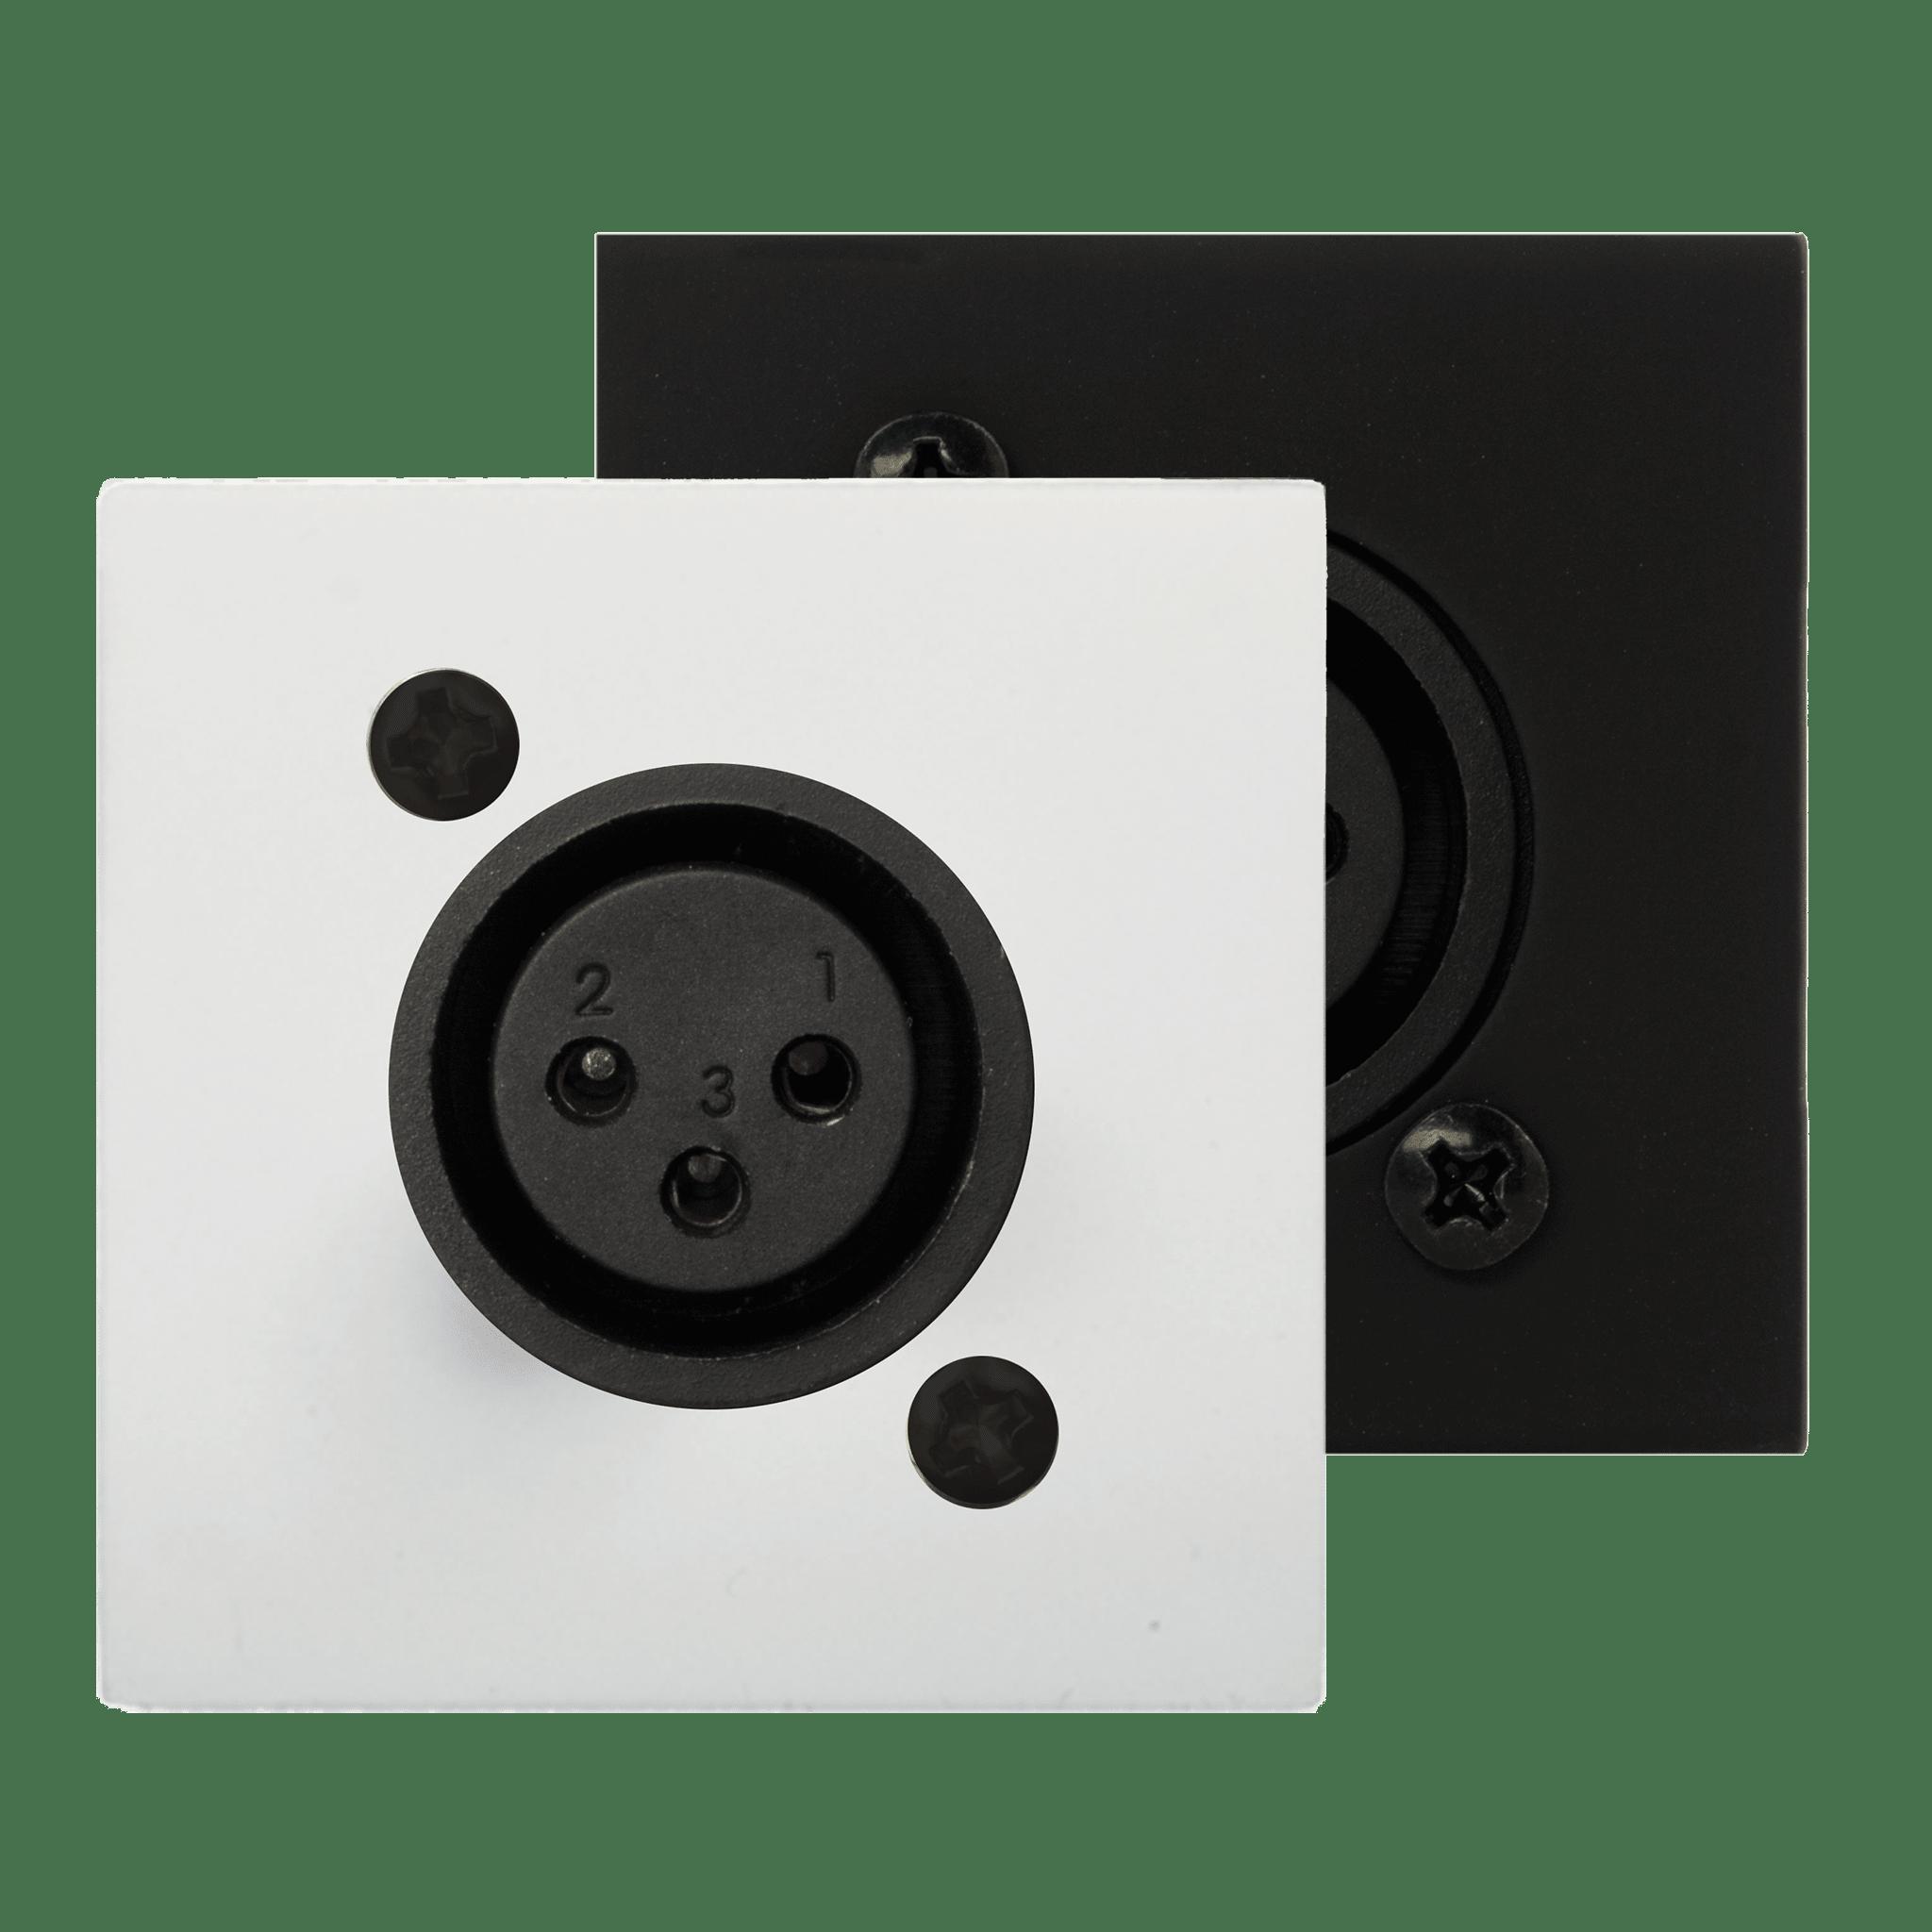 CP45XLFS - Connection plate XLR female 45 x 45 mm - solderless